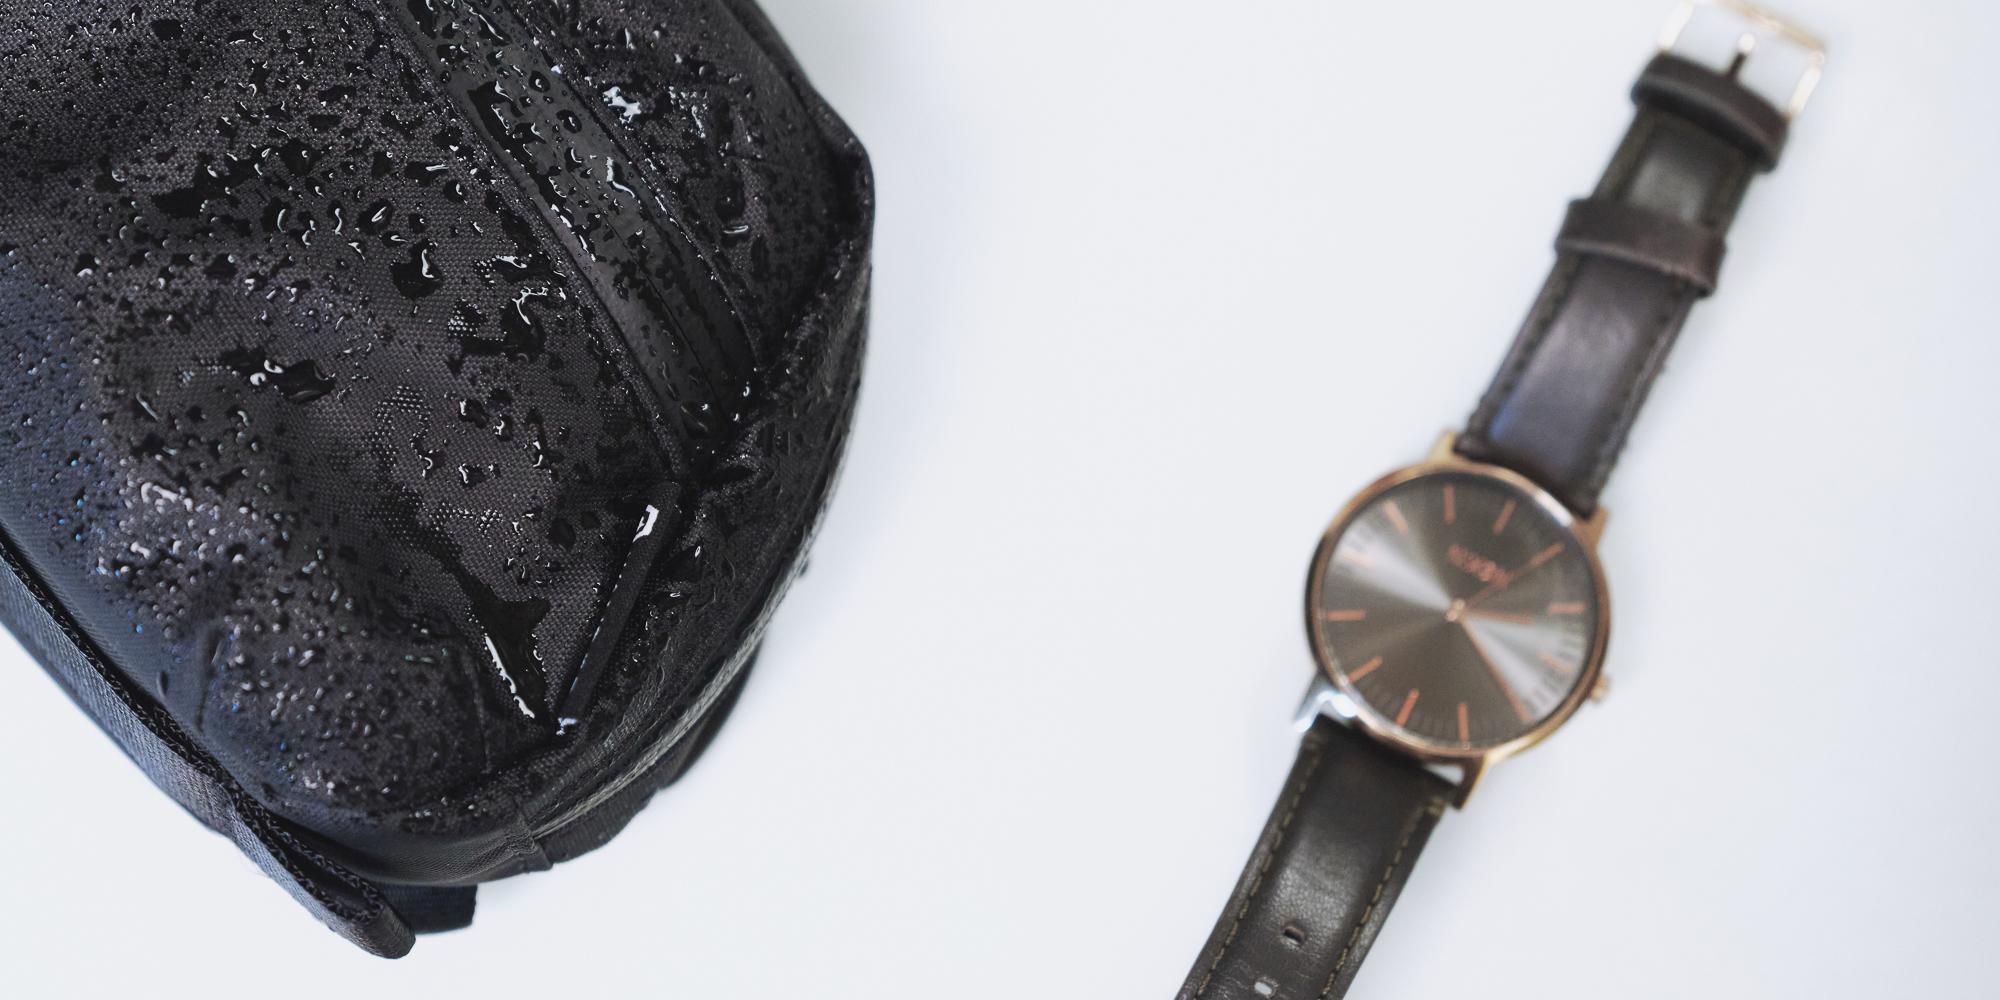 Wandrd Toiletry Bag Medium - durable and waterproof